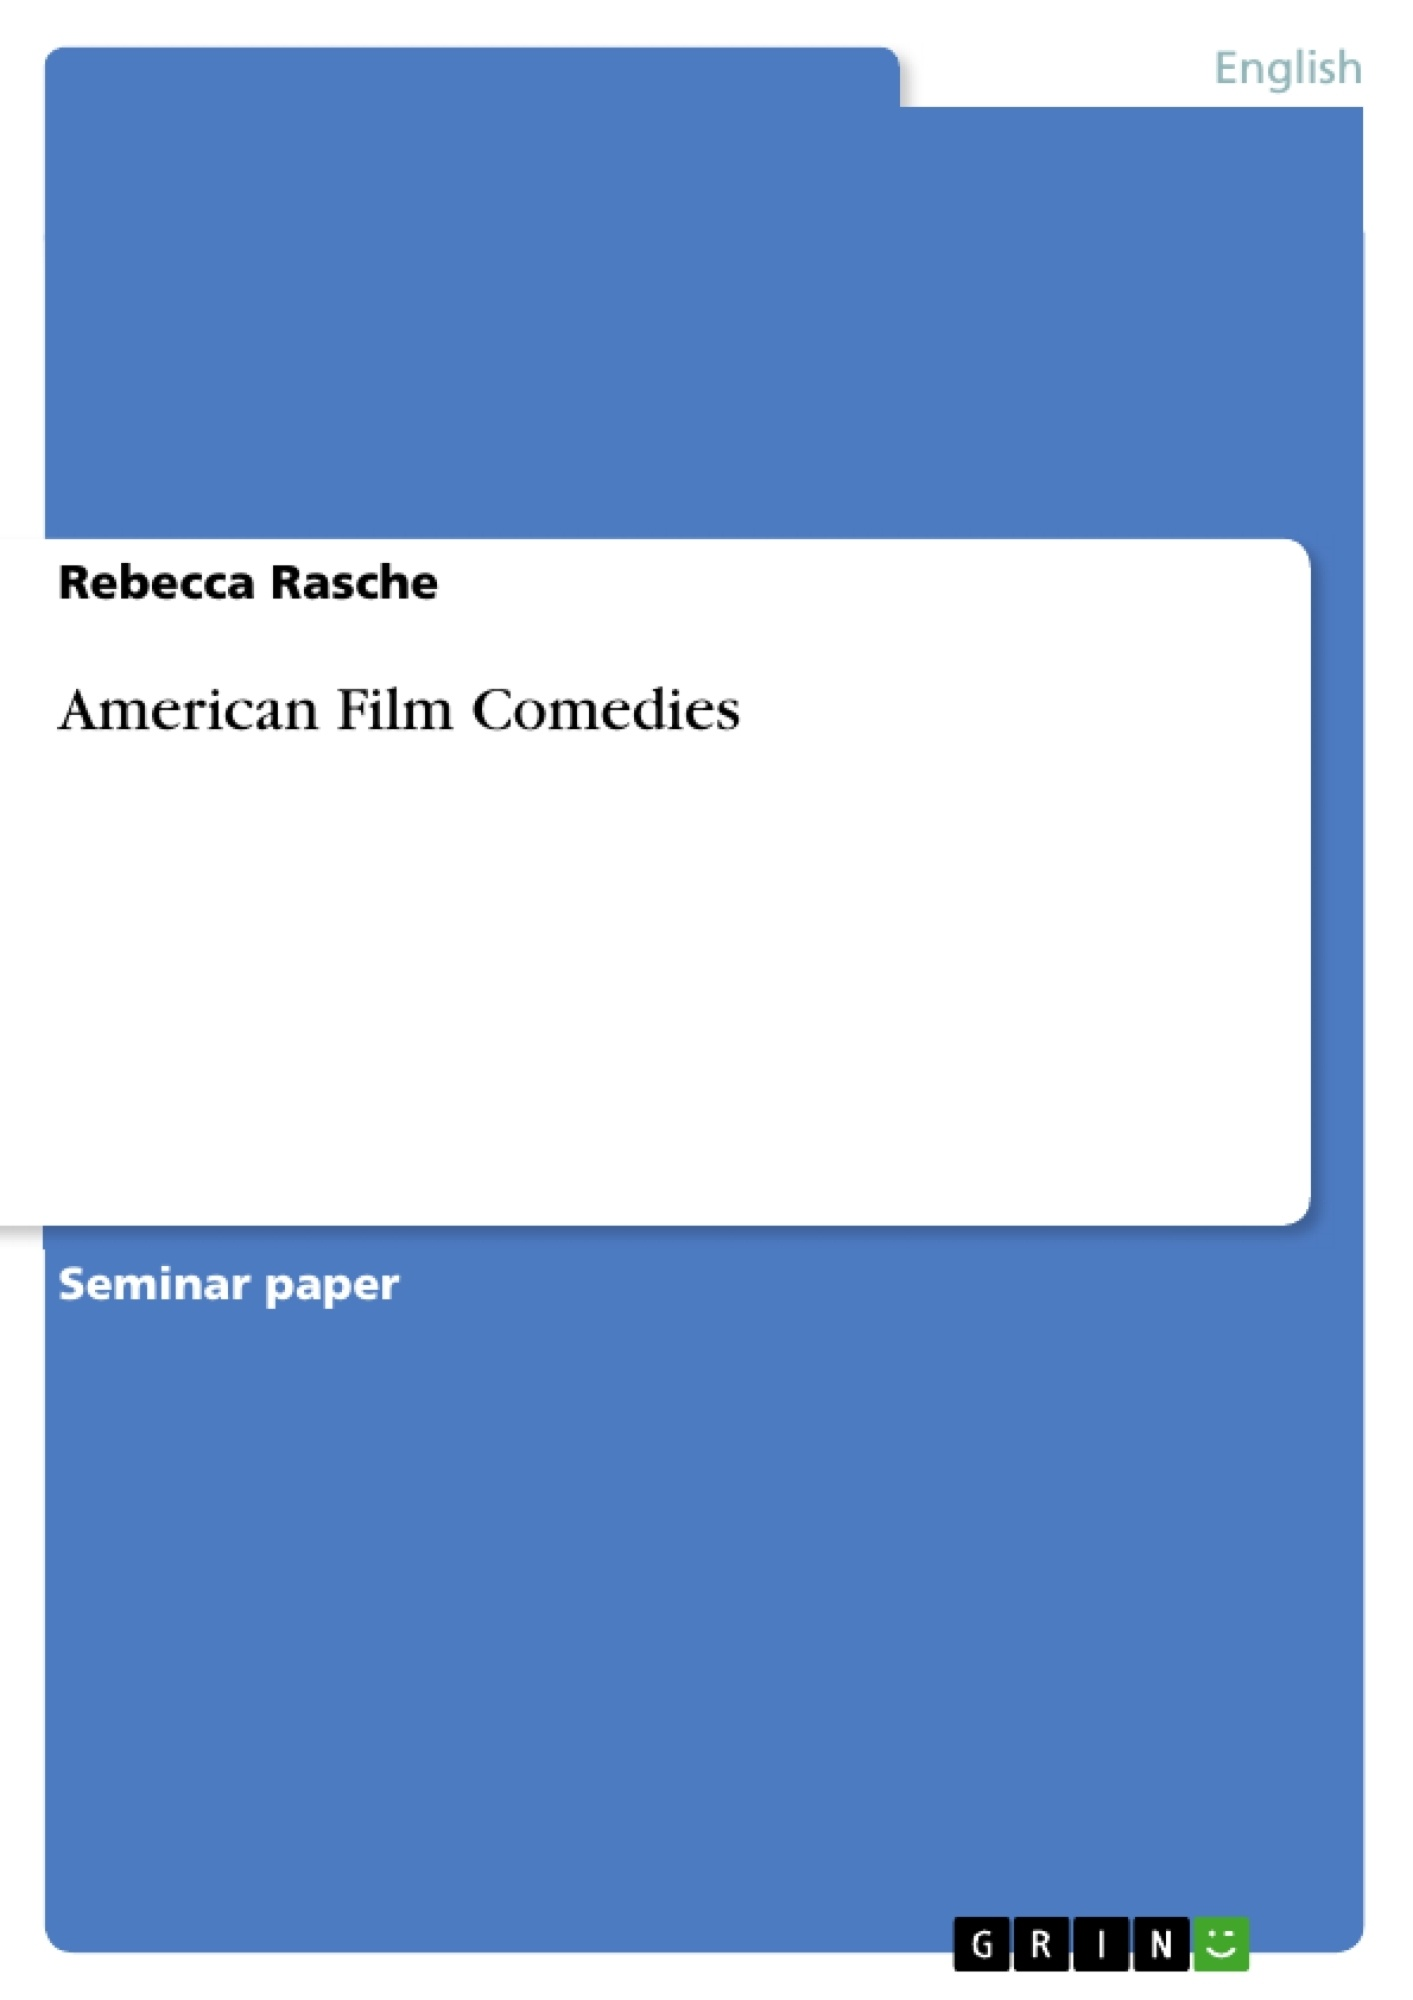 Title: American Film Comedies